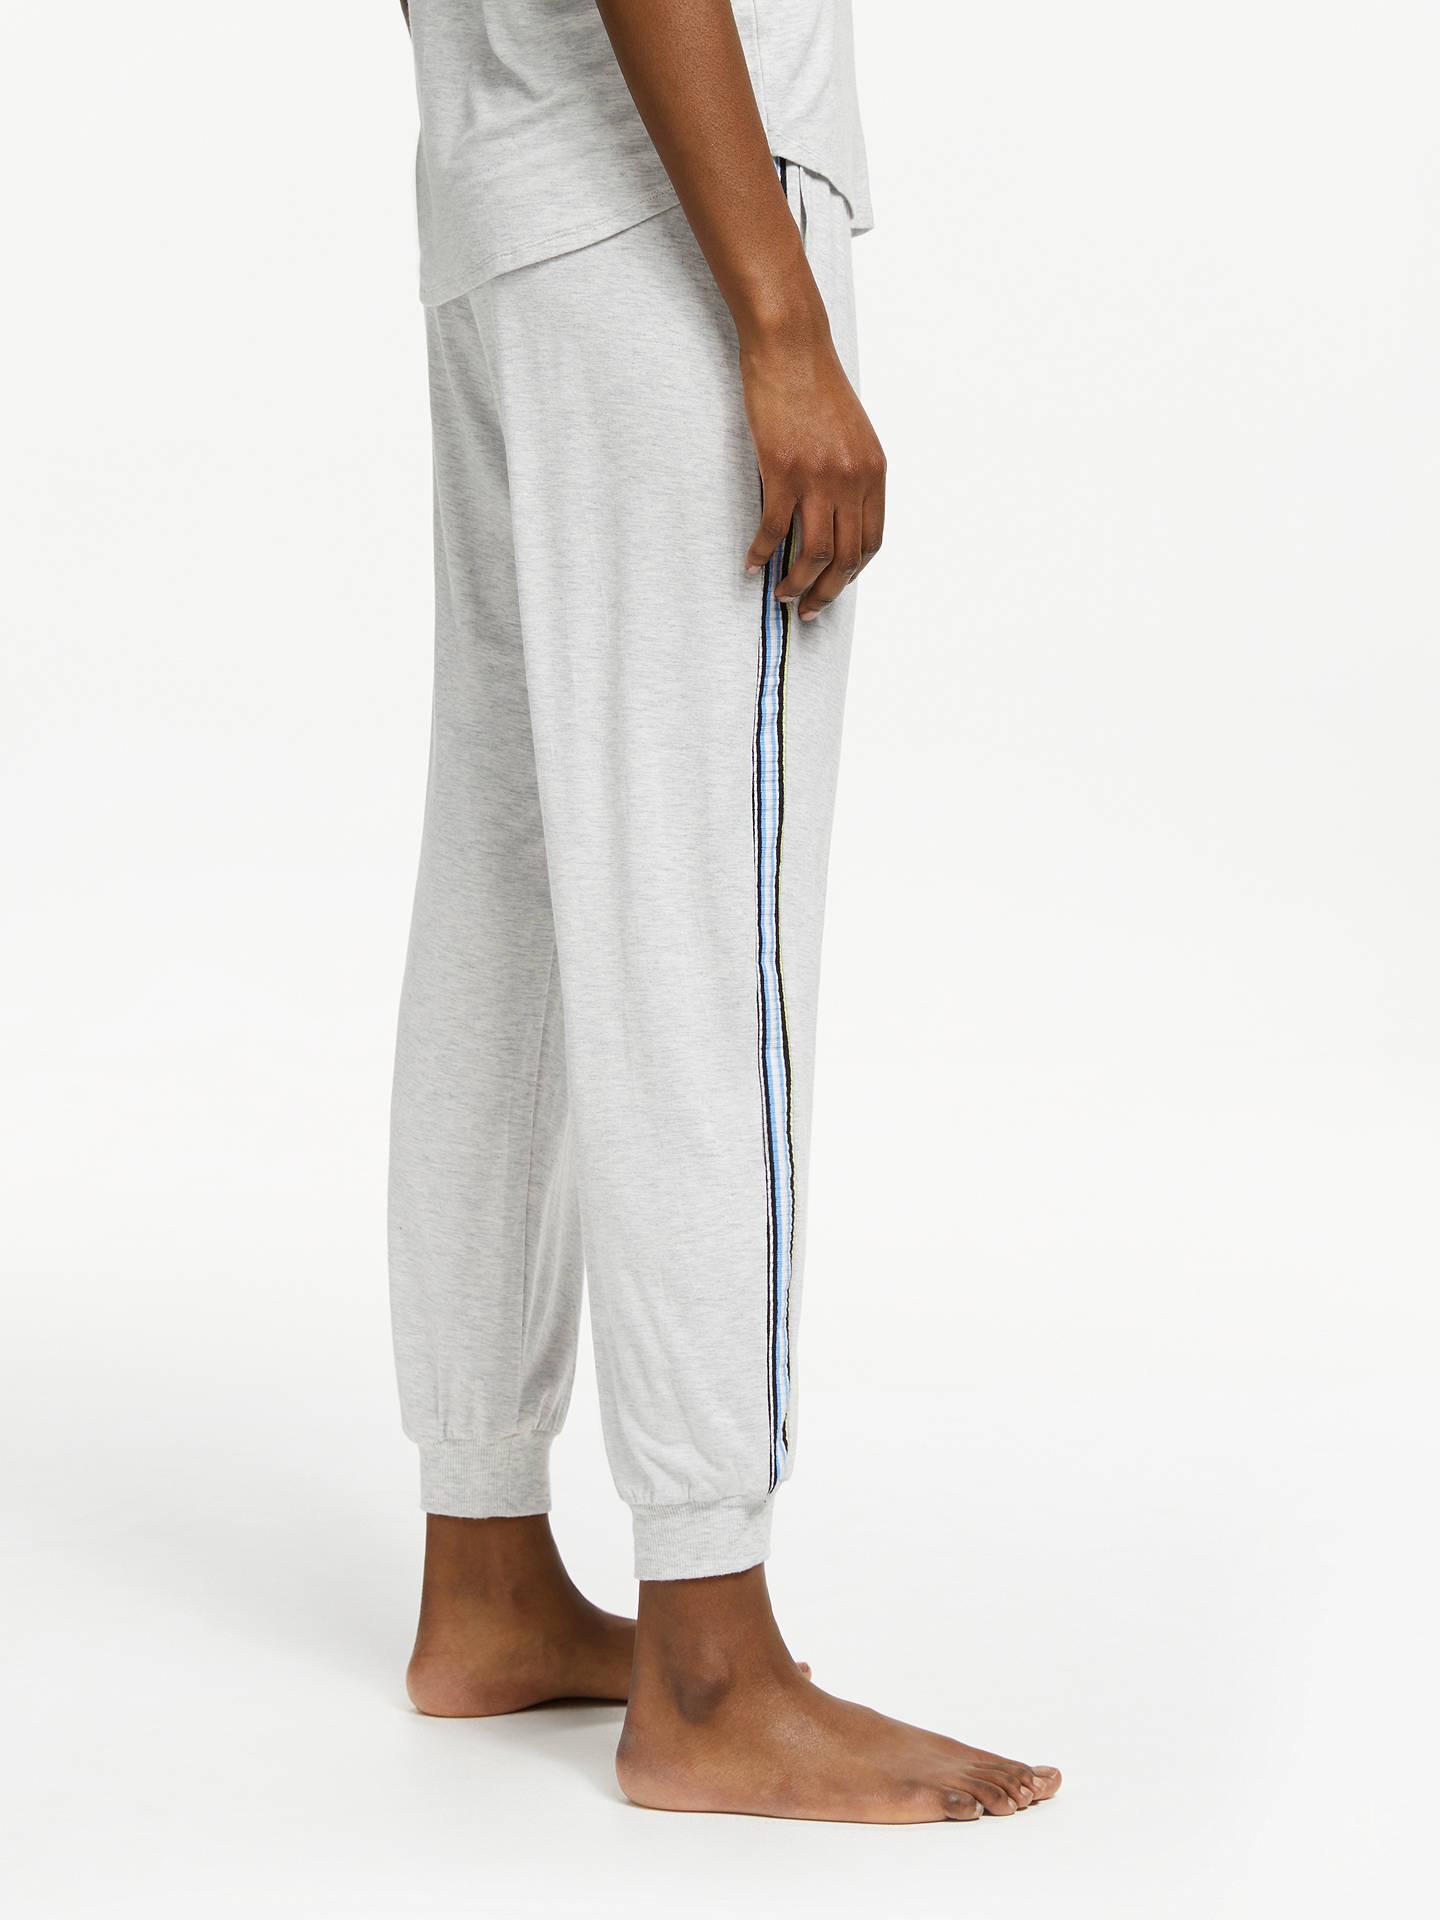 ... BuyDKNY Earn Your Stripes Sweat Pyjama Bottoms 7151c9aed